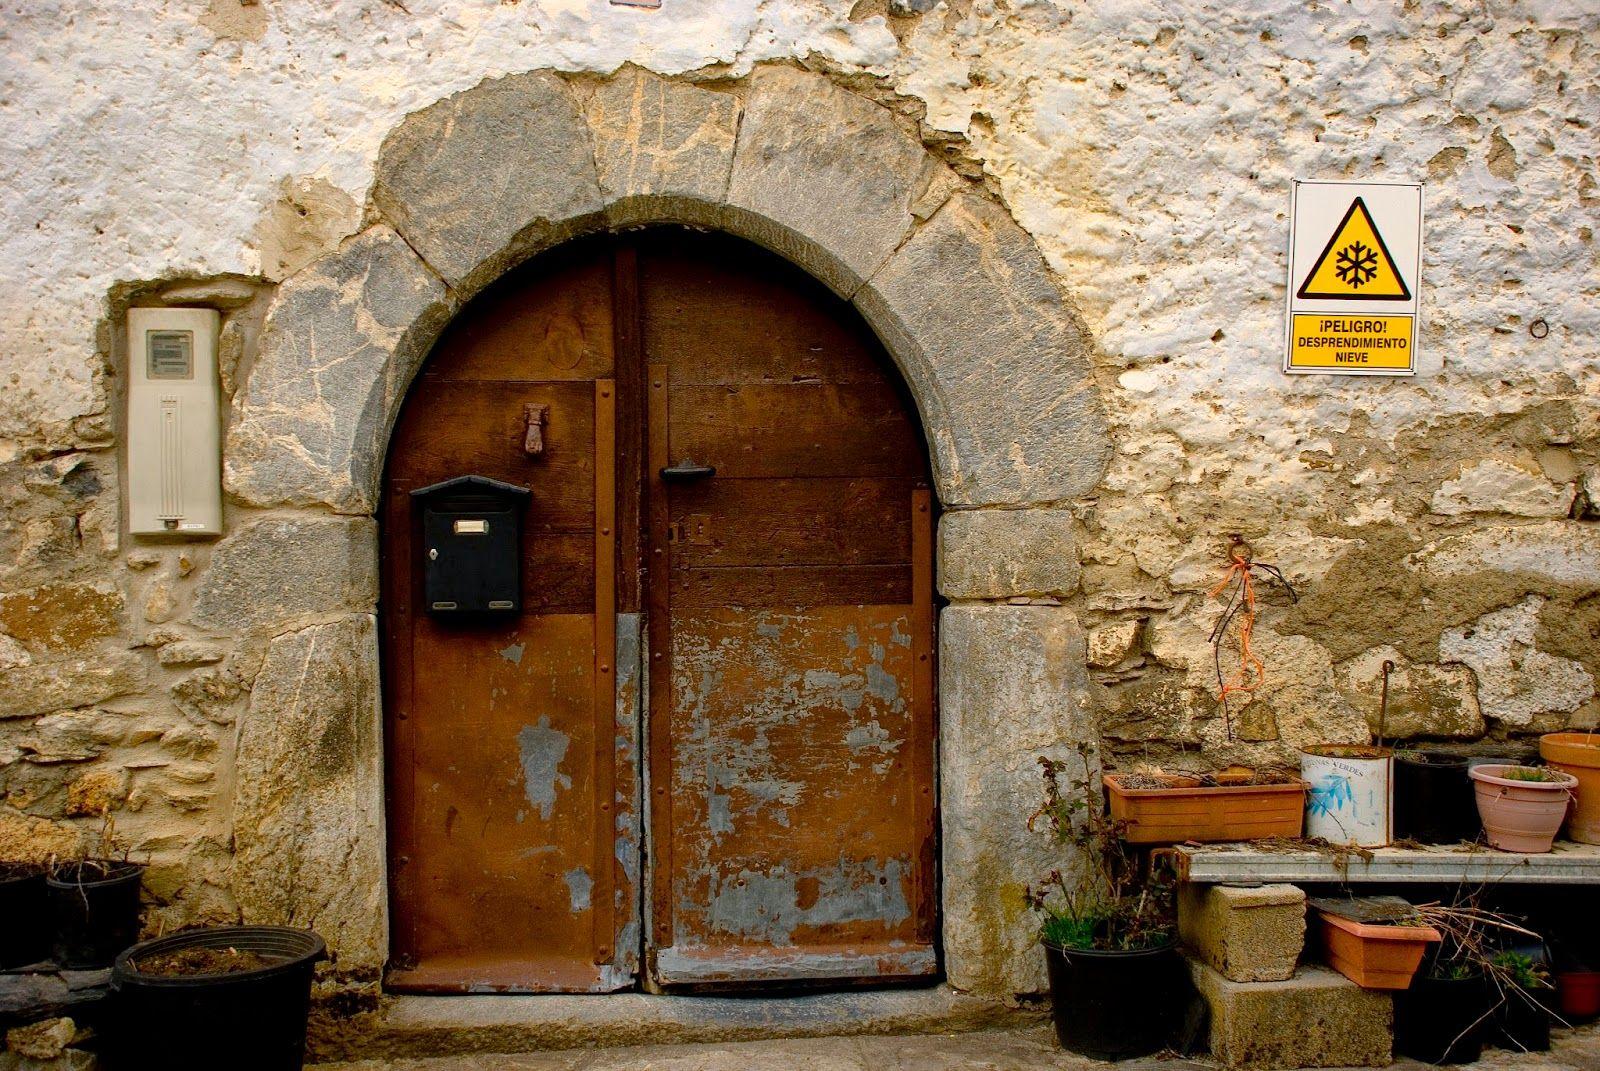 Las puertas de Sallent de Gállego | Sallent de Gállego